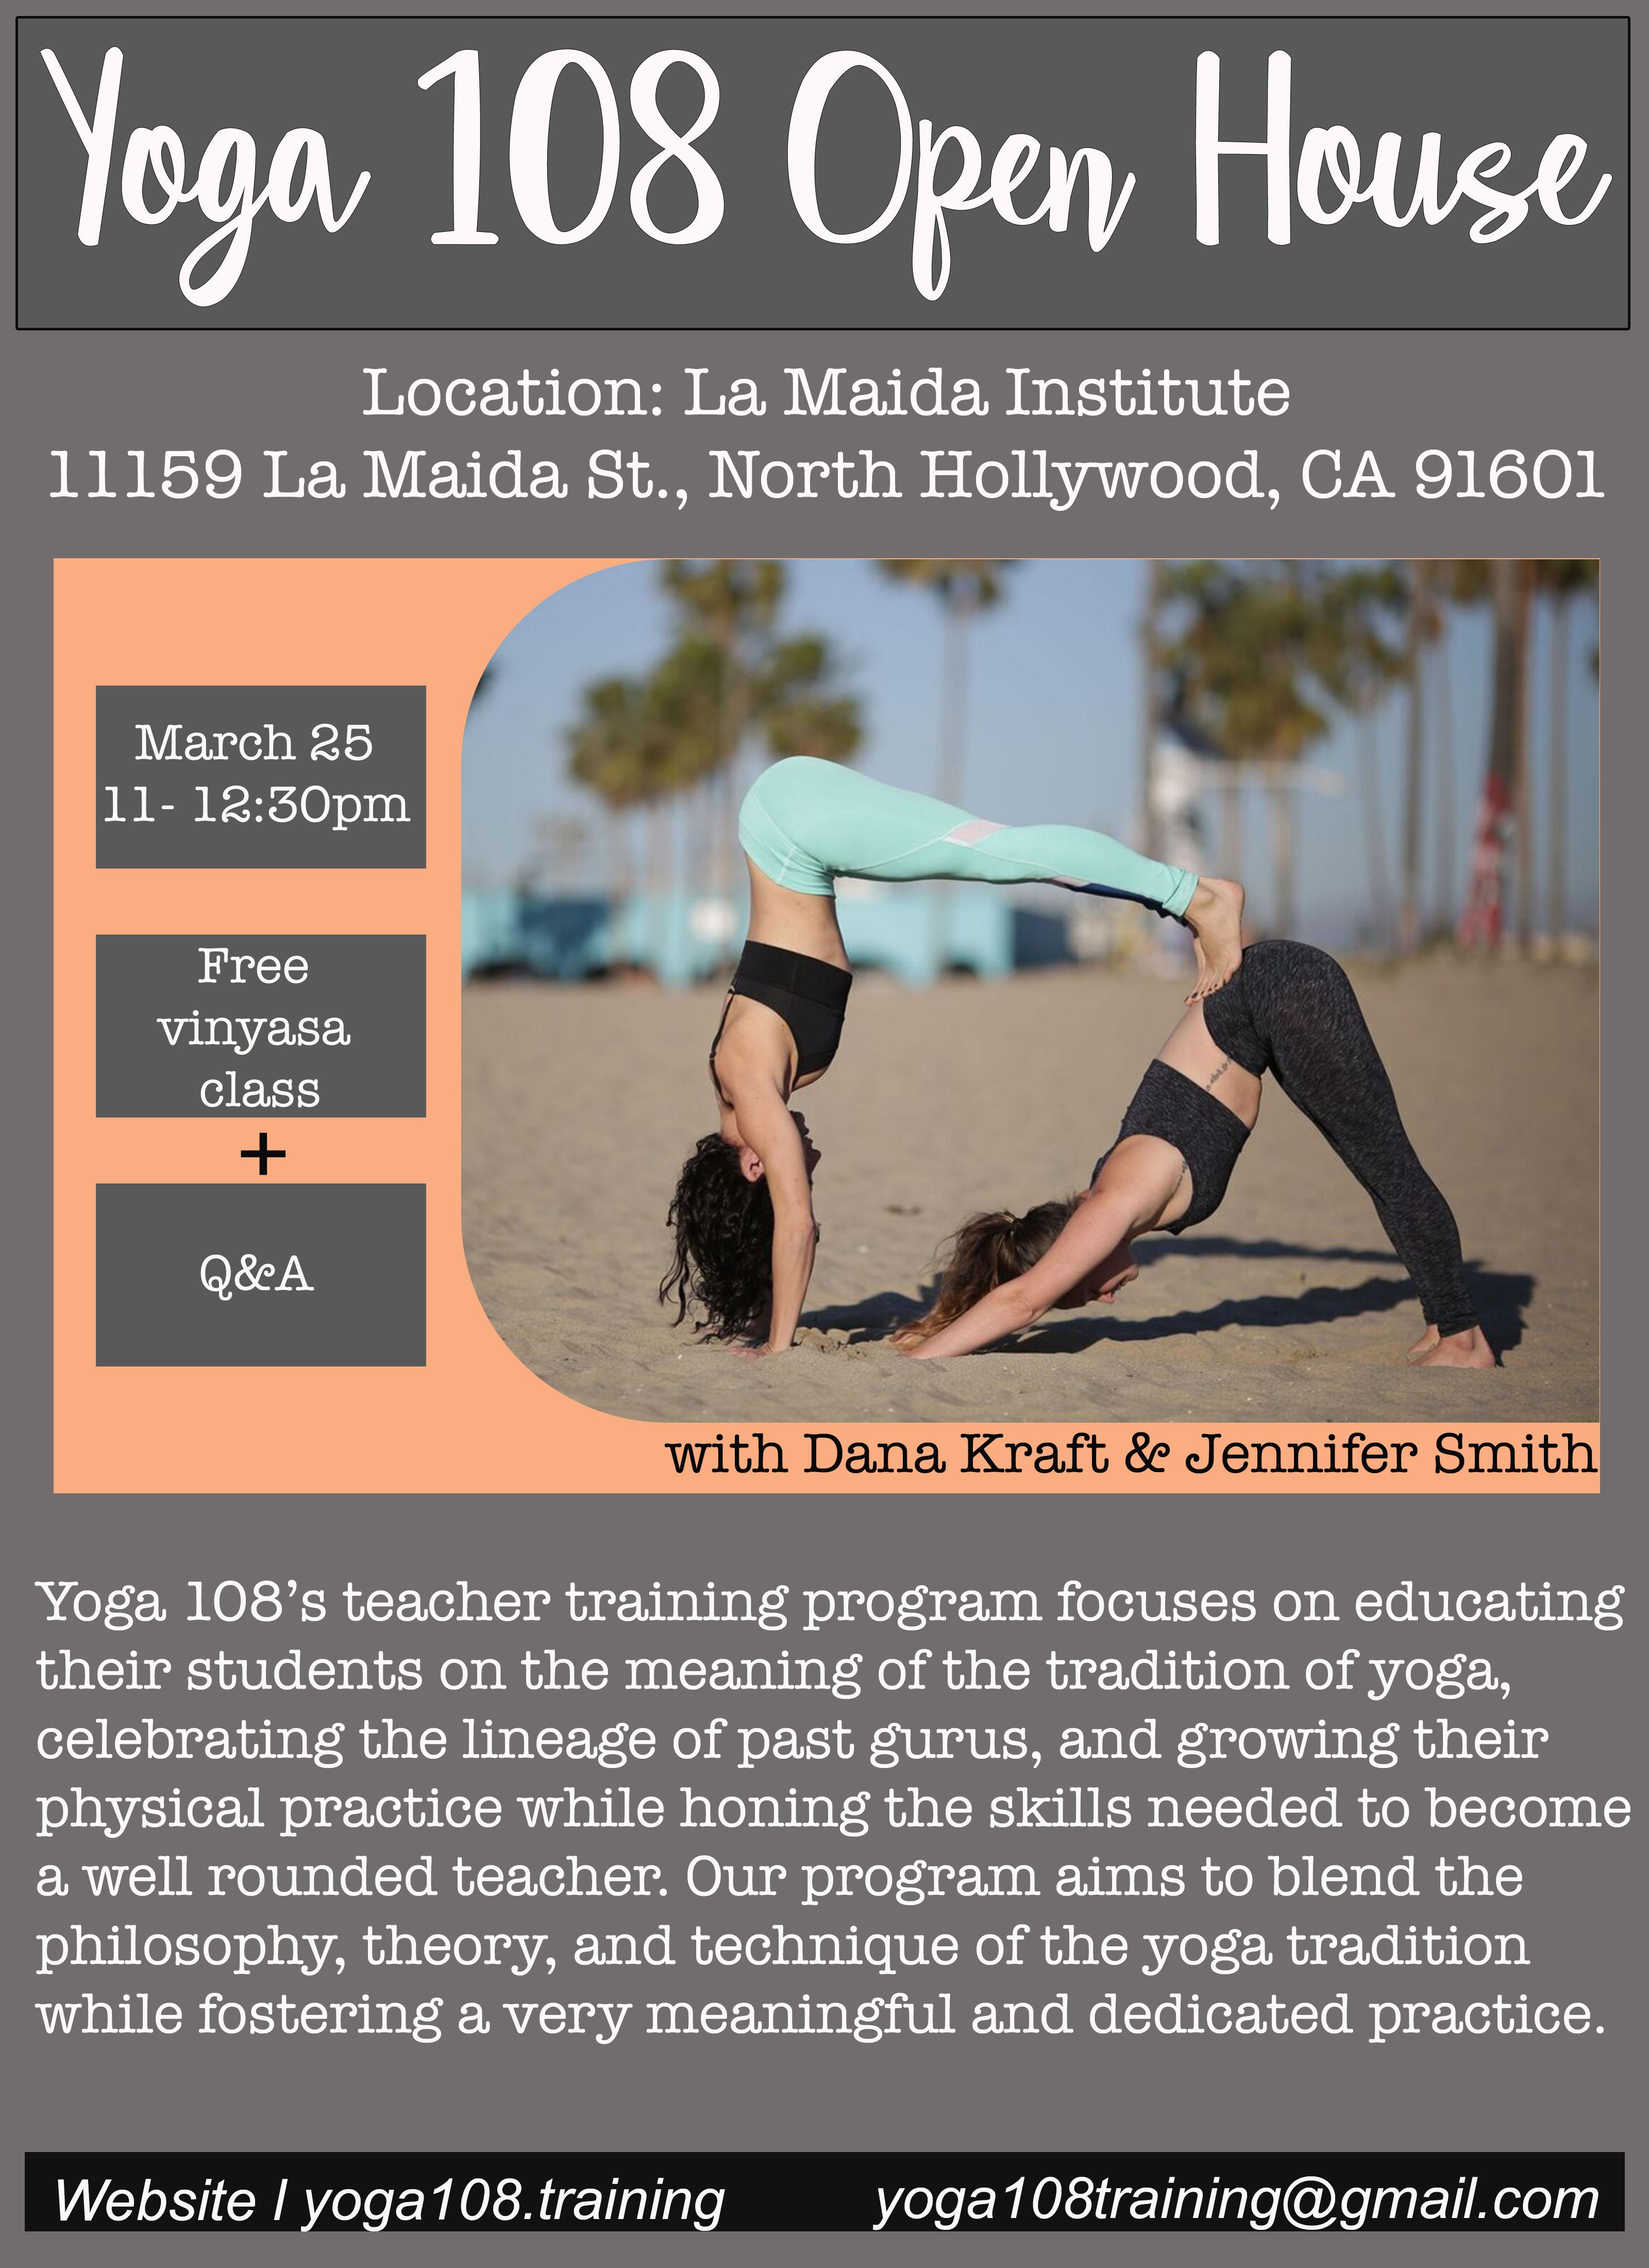 Yoga 108 Teacher Training Open House La Maida Institute